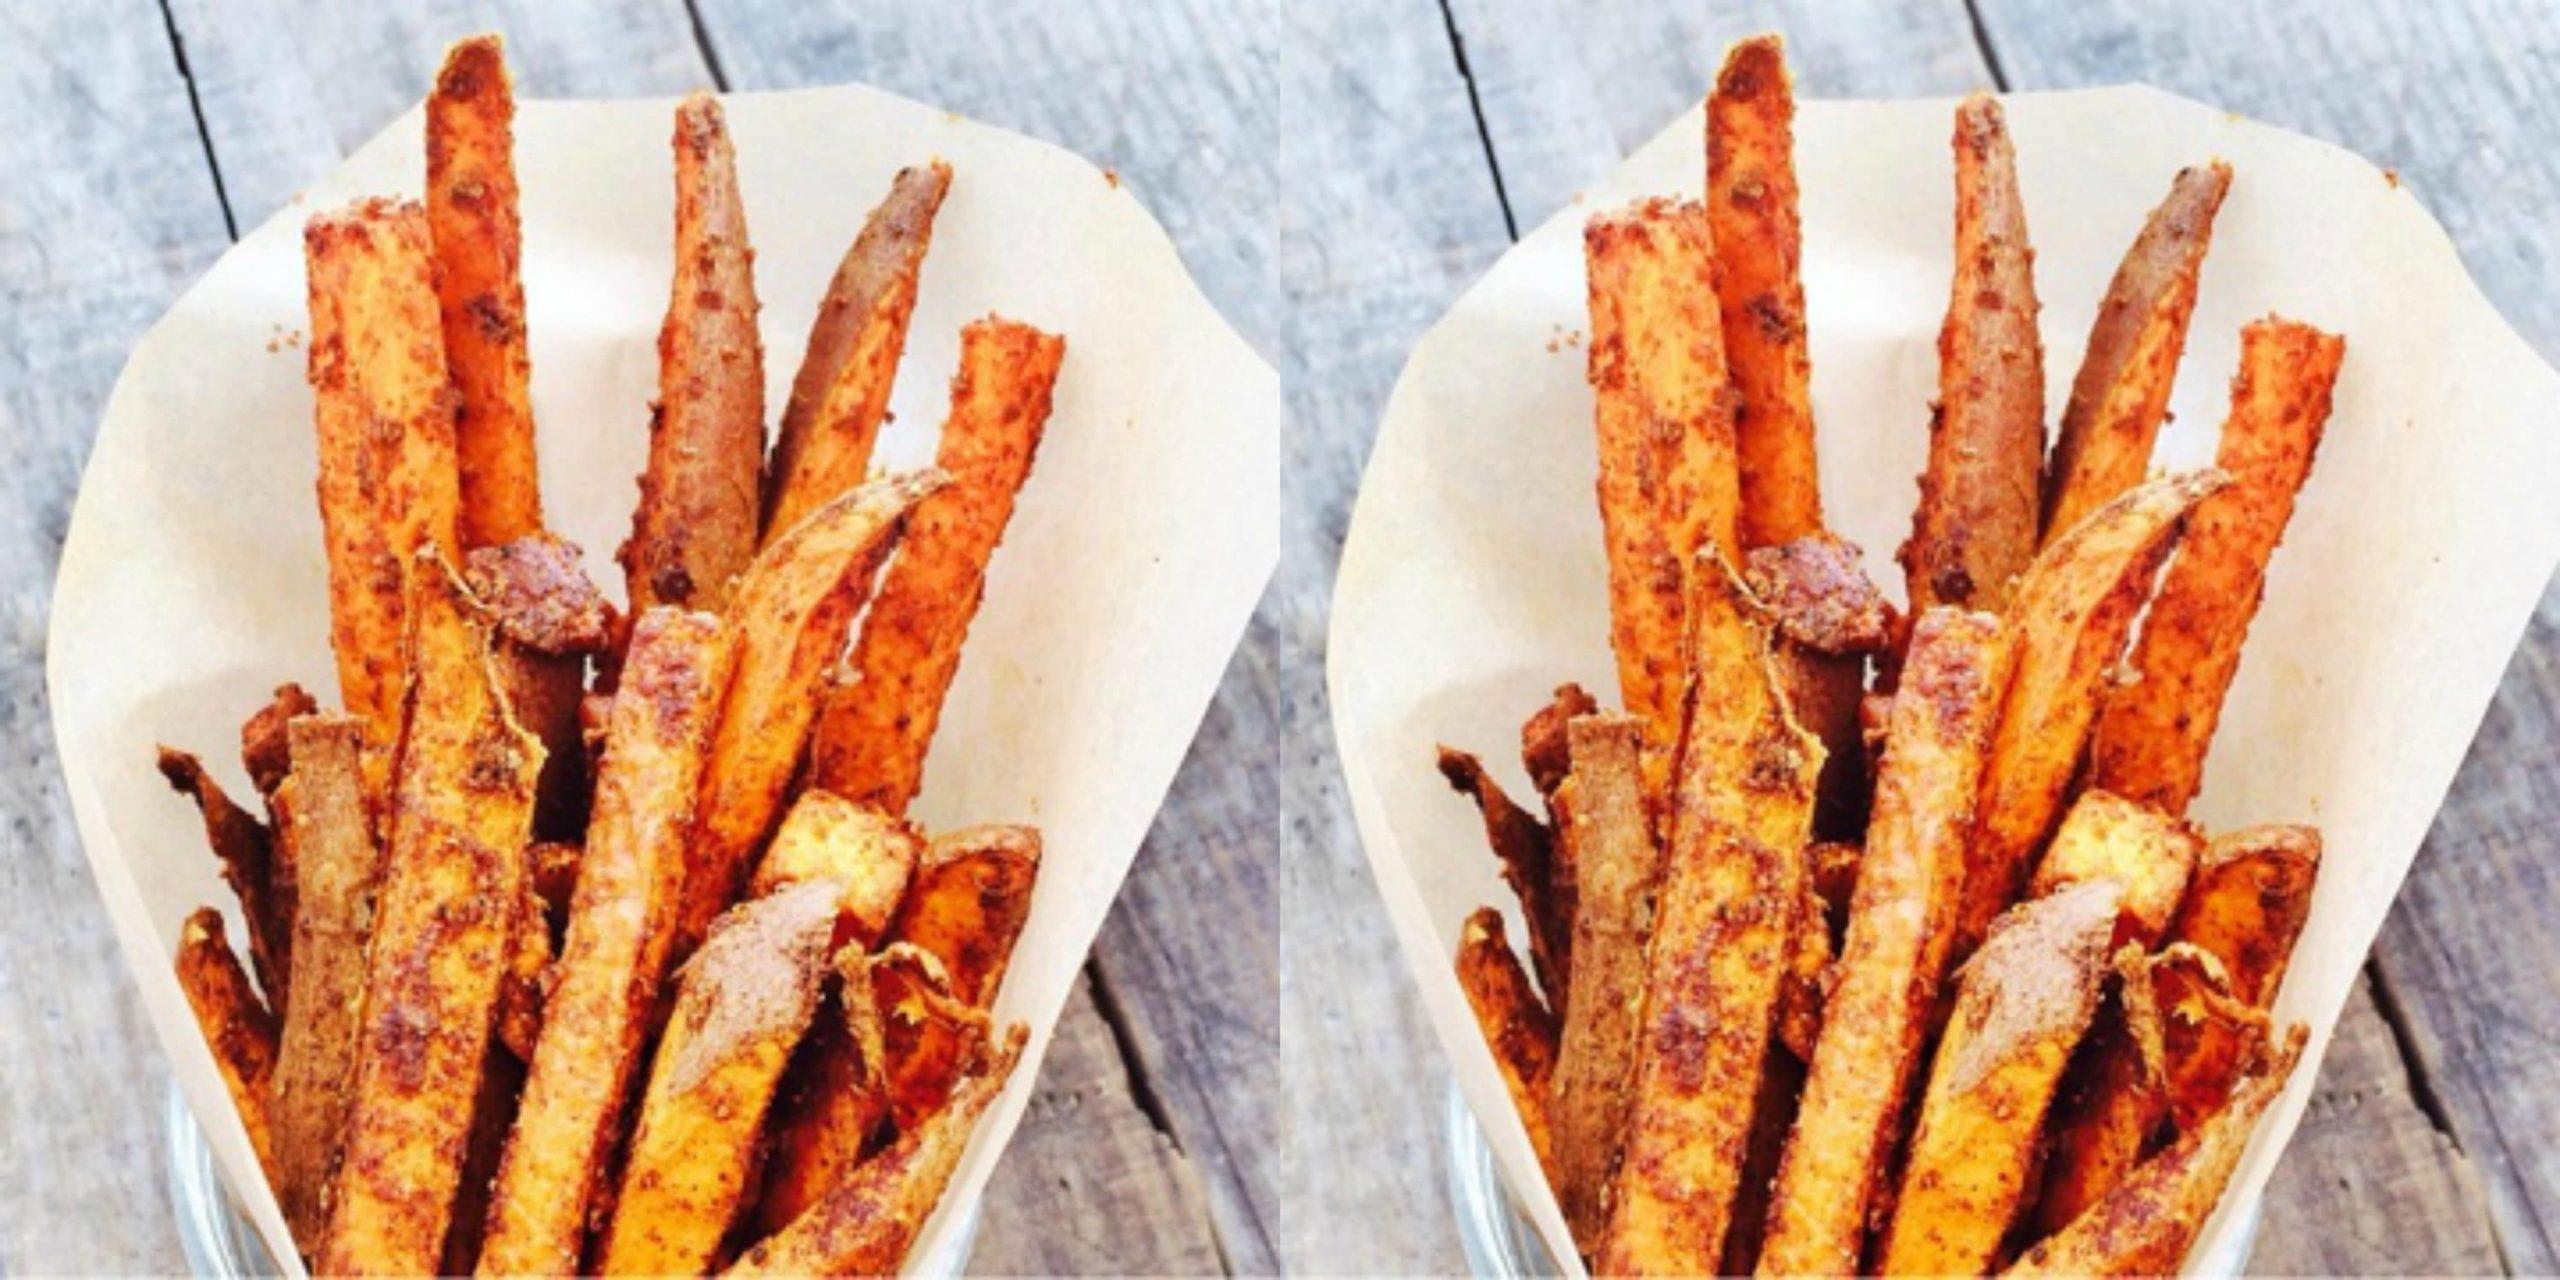 Delicious Healthy Recipes - Sweet Potato Fries